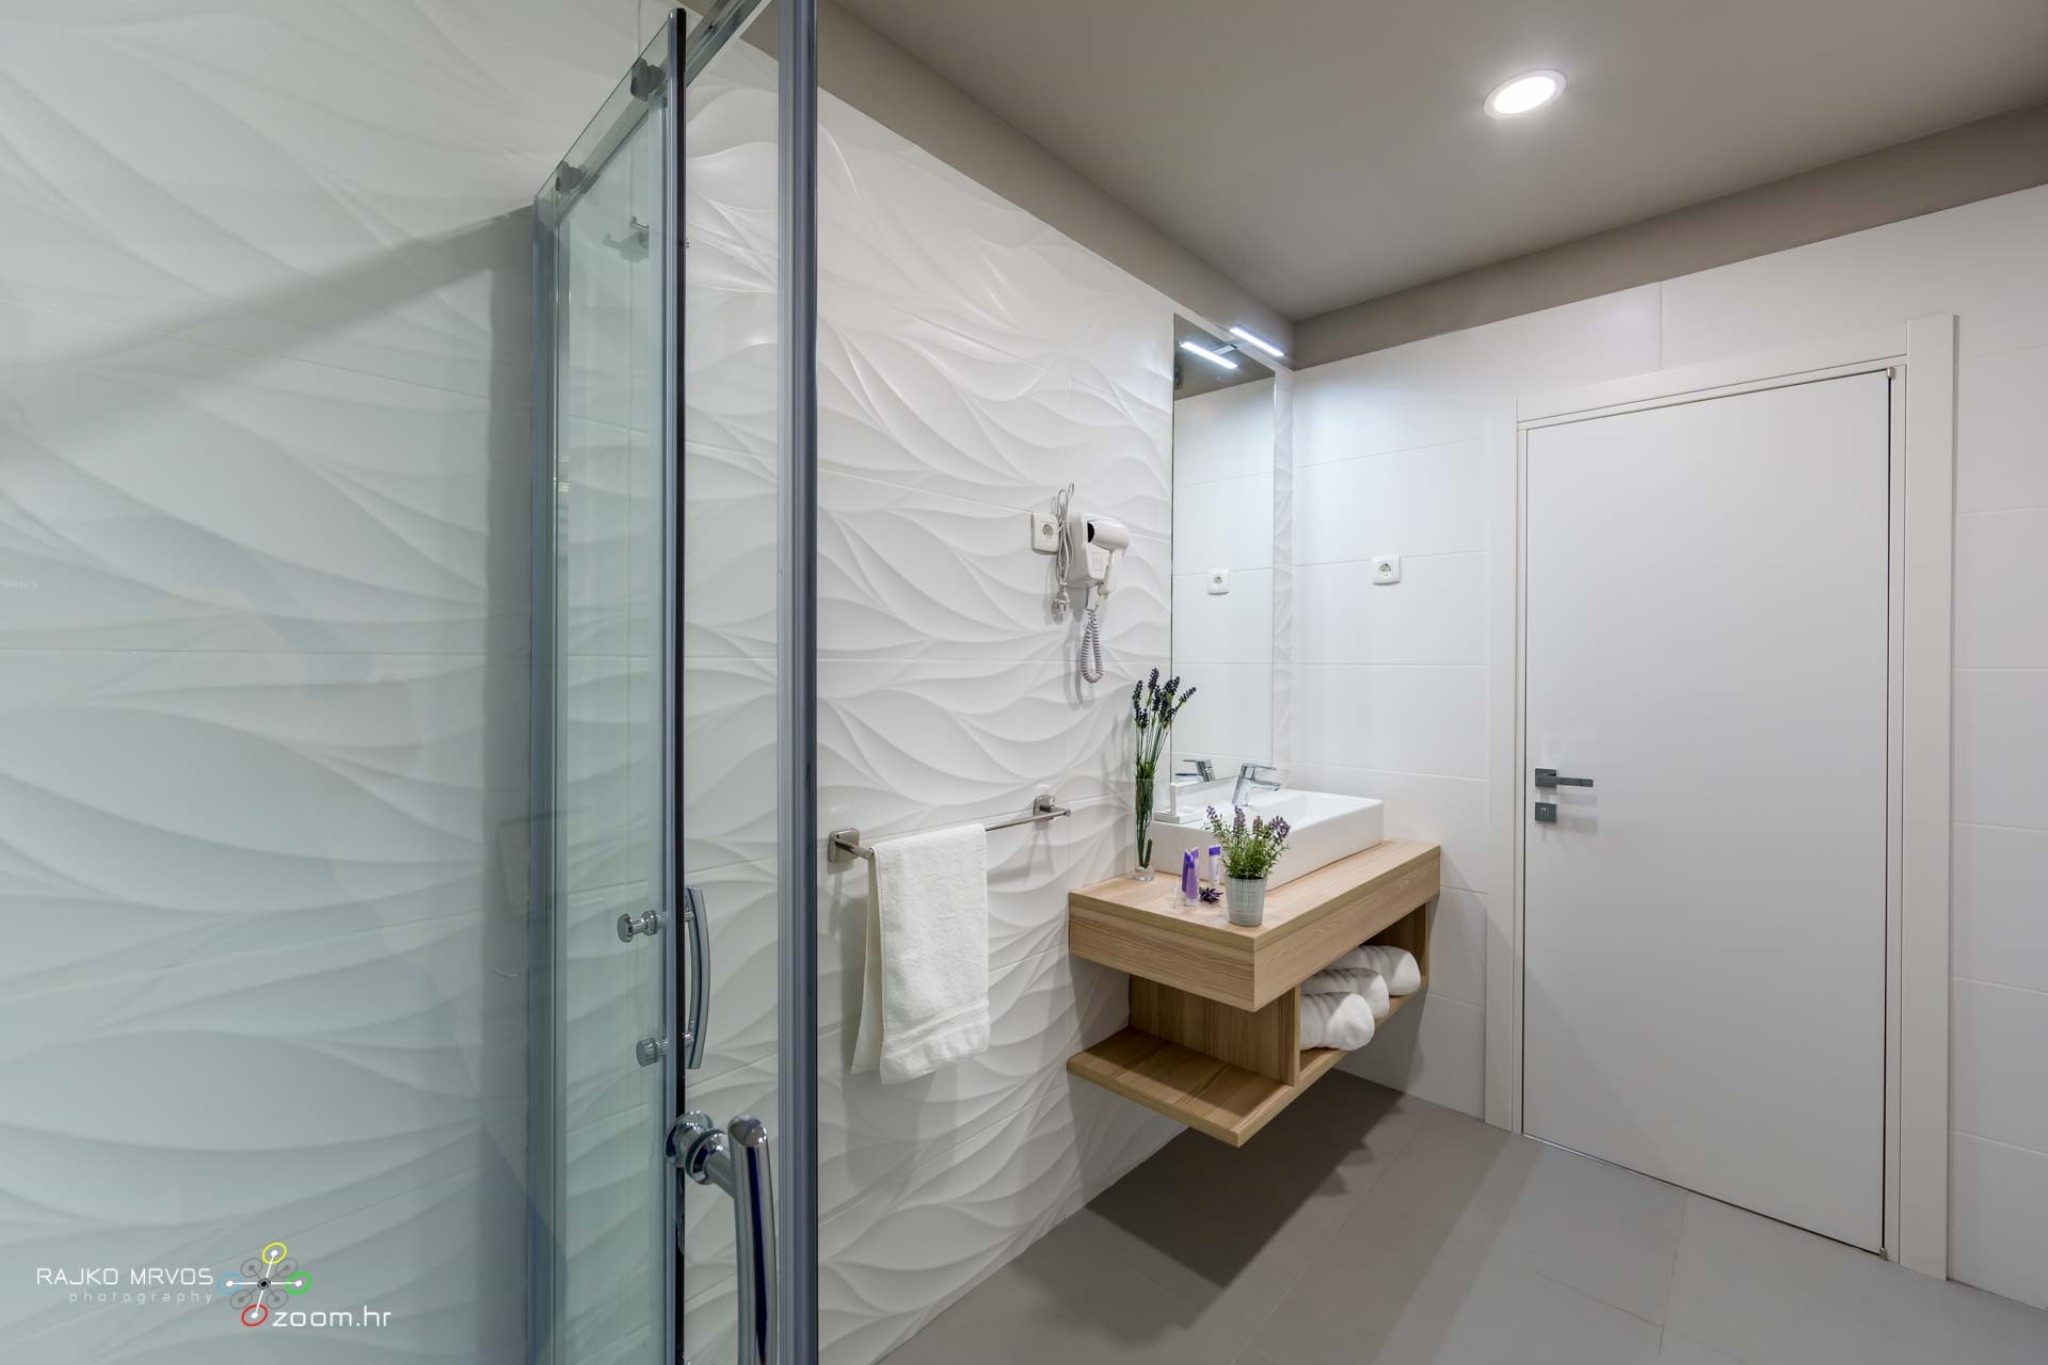 fotografiranje-interijera-fotograf-eksterijera-apartmana-vila-kuca-apartman-Preelook-25